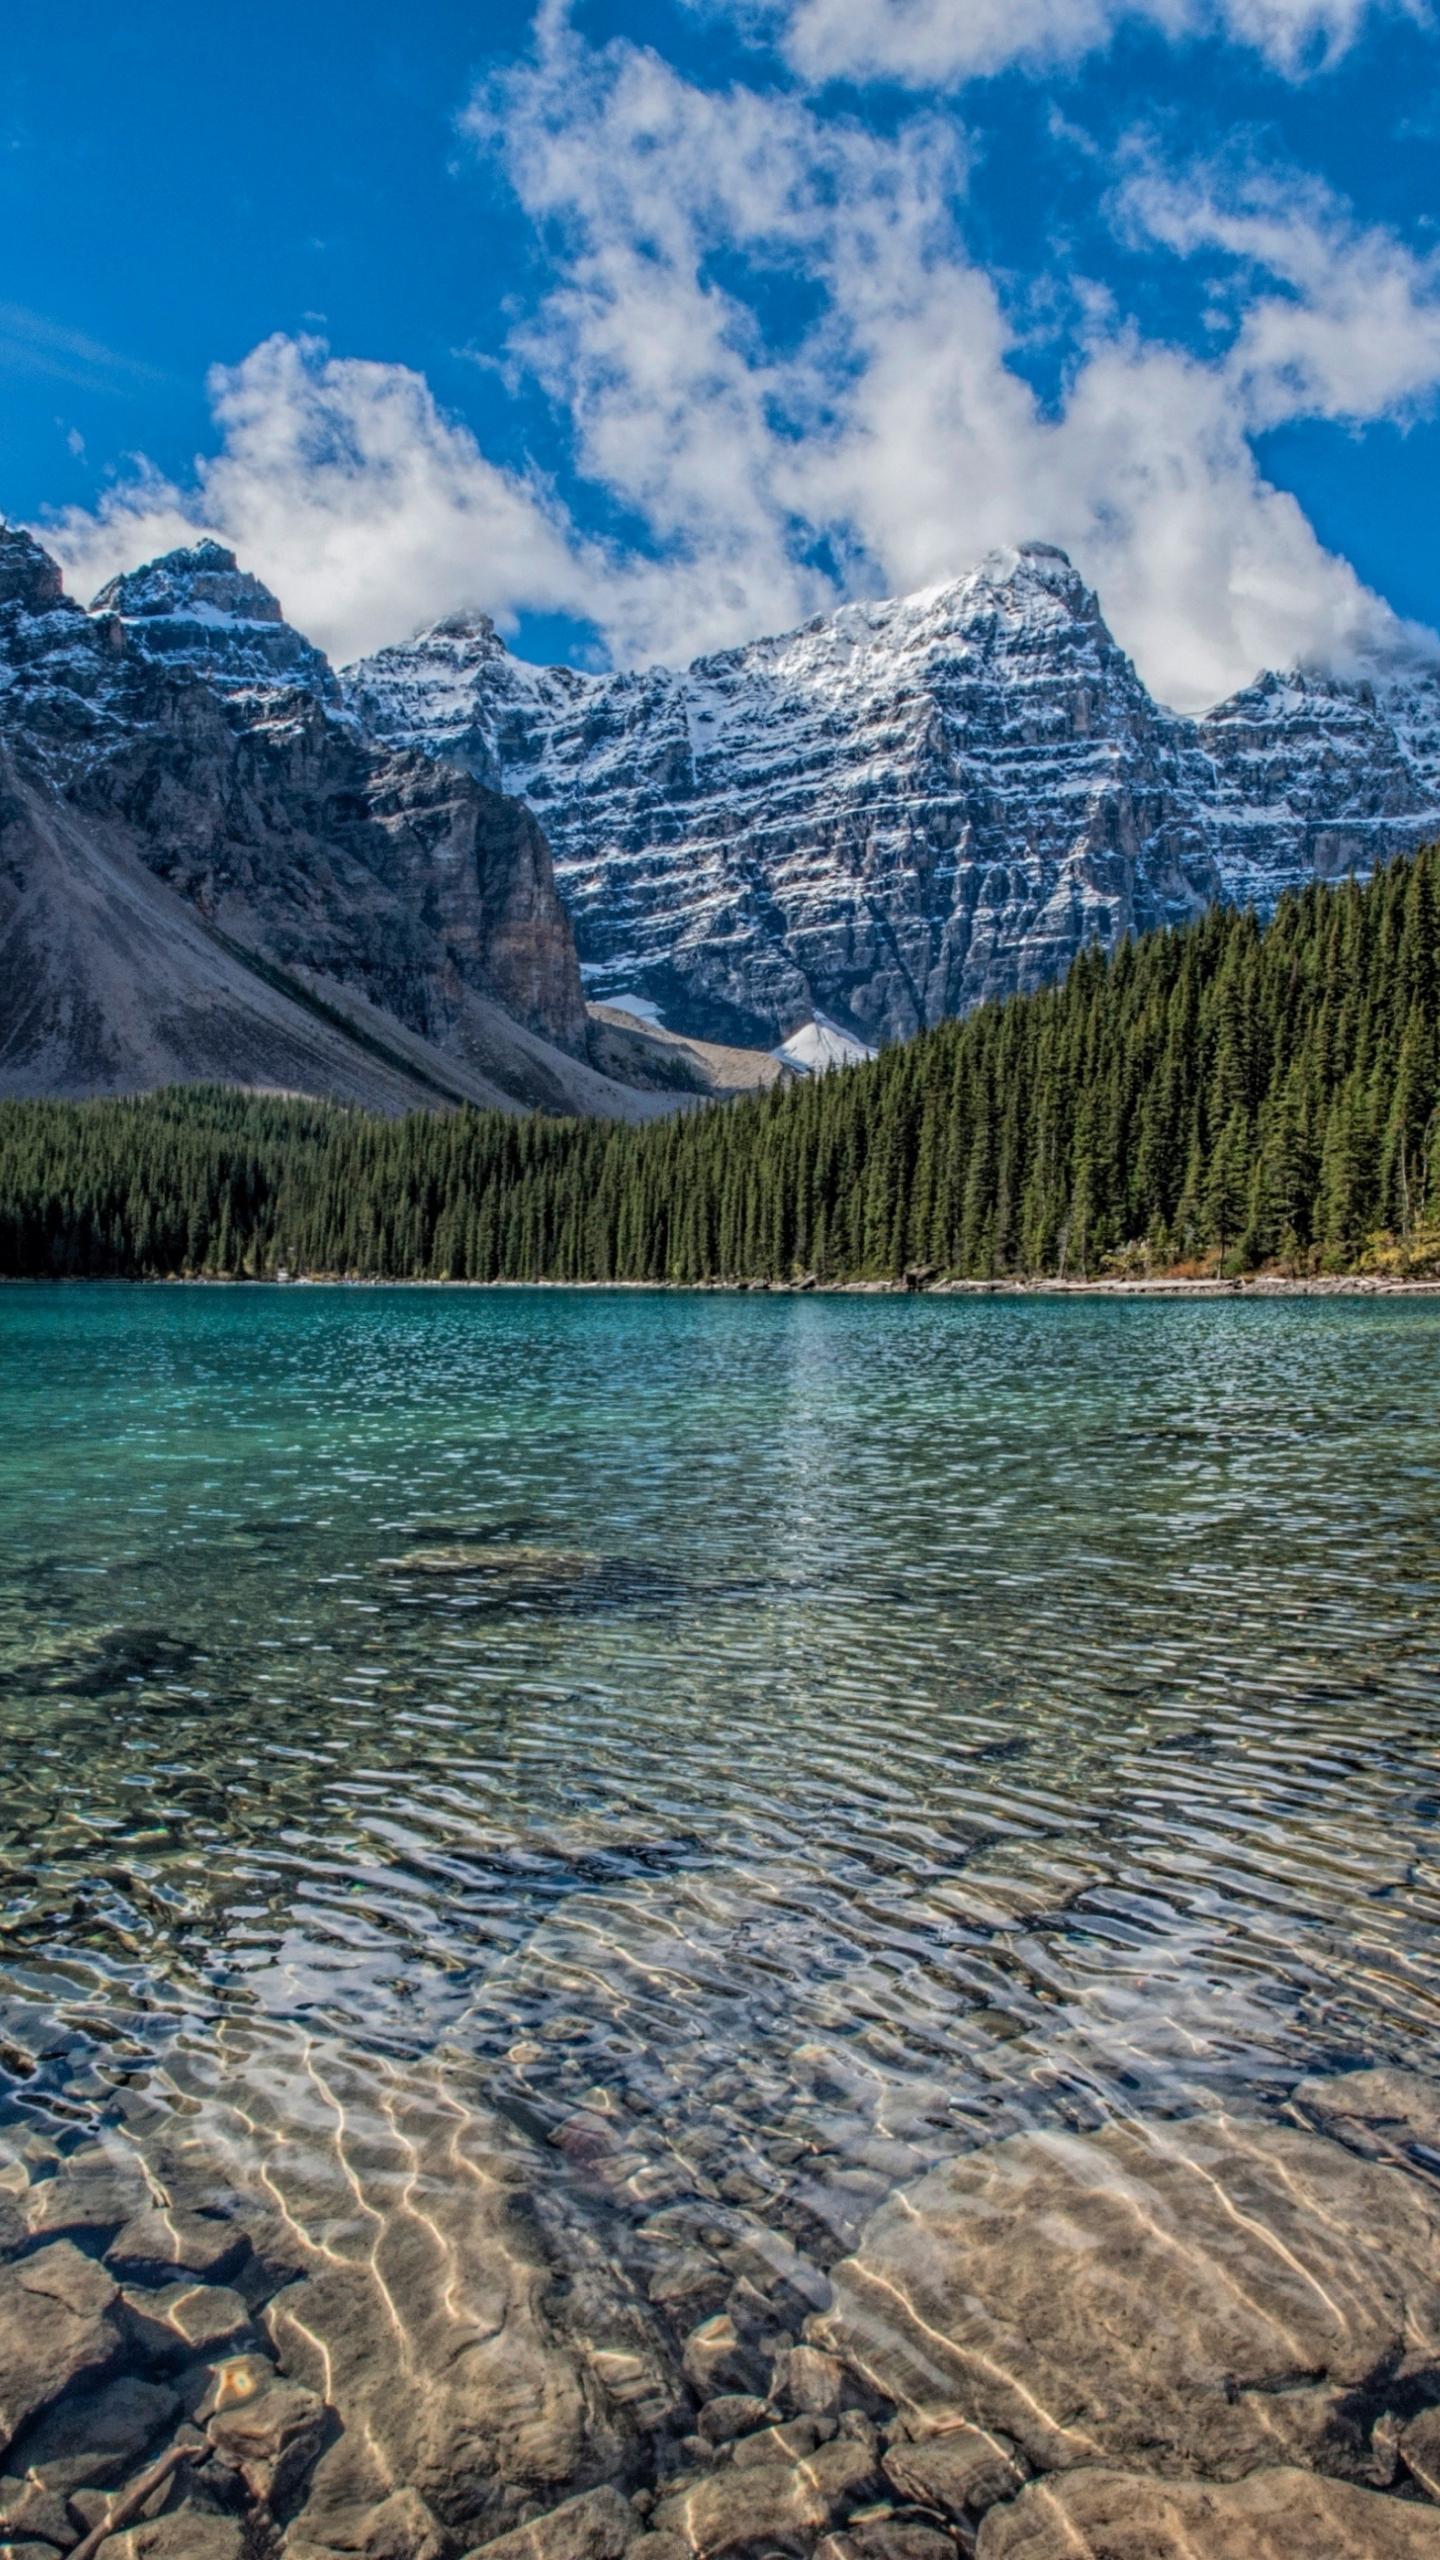 Fantastic Wallpaper Mountain Samsung Galaxy S7 - clean-lake-mountains-range-trees-nature-4k  You Should Have_738430.jpg